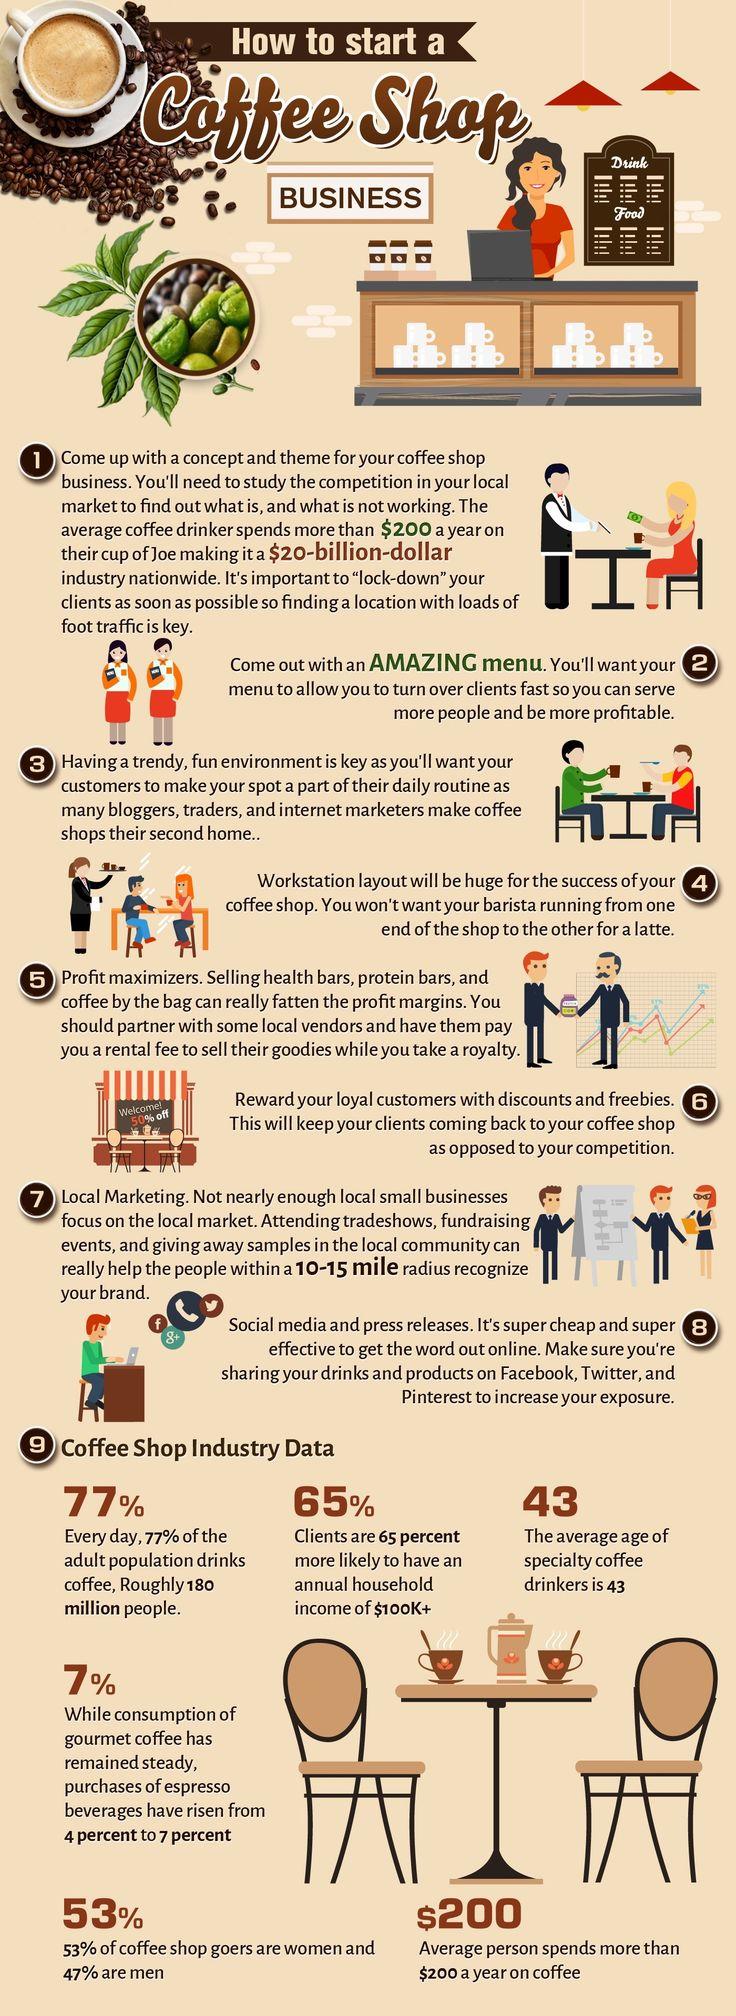 How To Start A Coffee Shop Business  StartupJungle